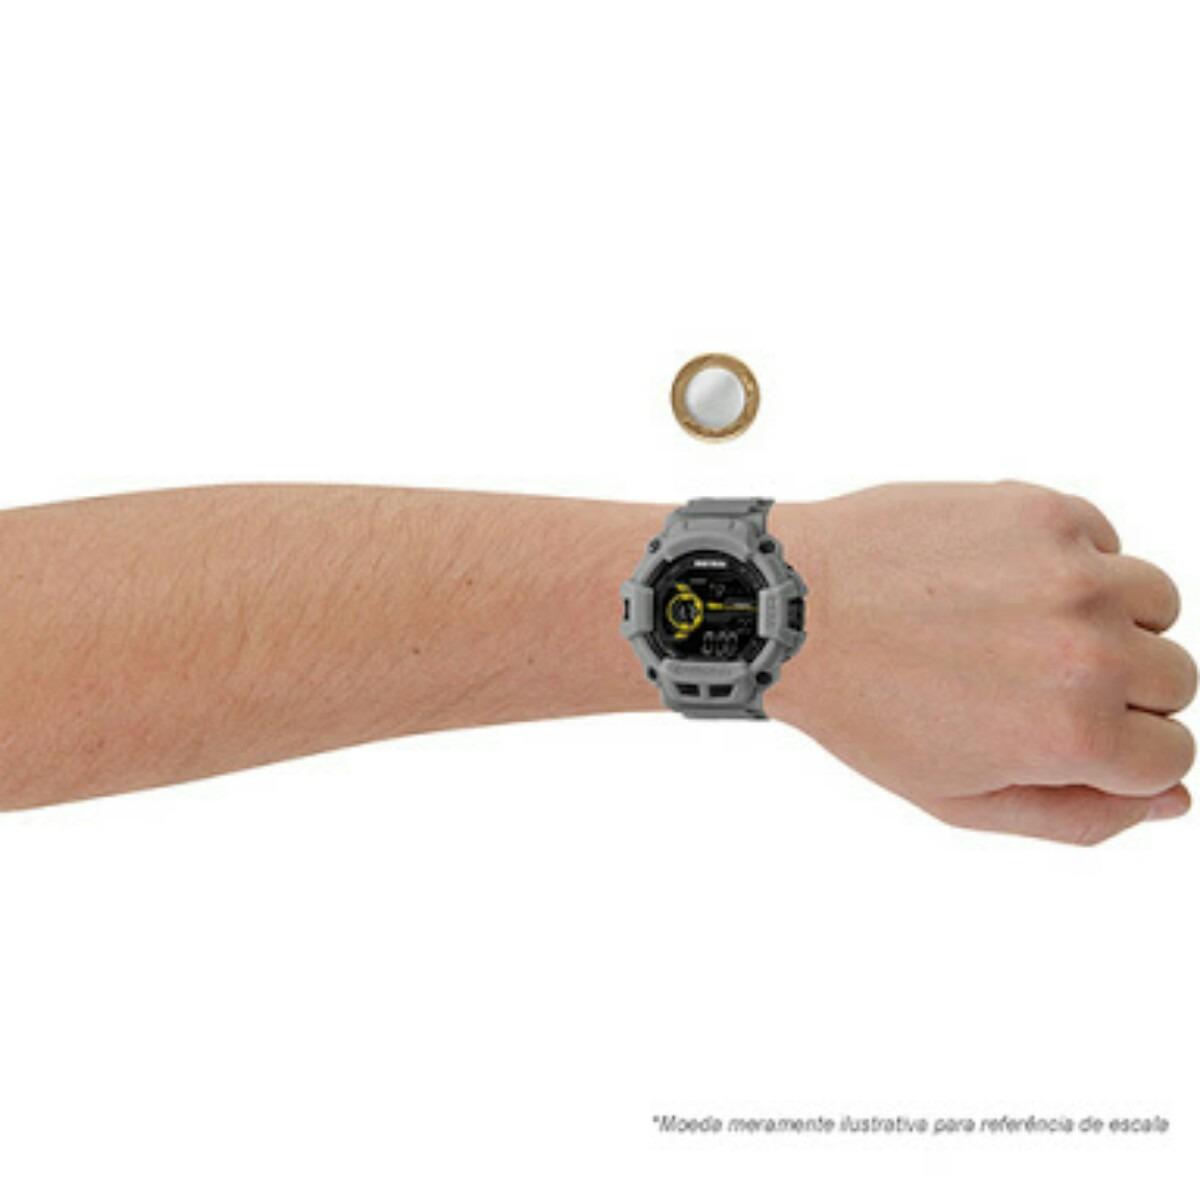 ebc5fe6f10b1a relógio mormaii g-shock acqua pro adventure mo1105ab 8y. Carregando zoom.